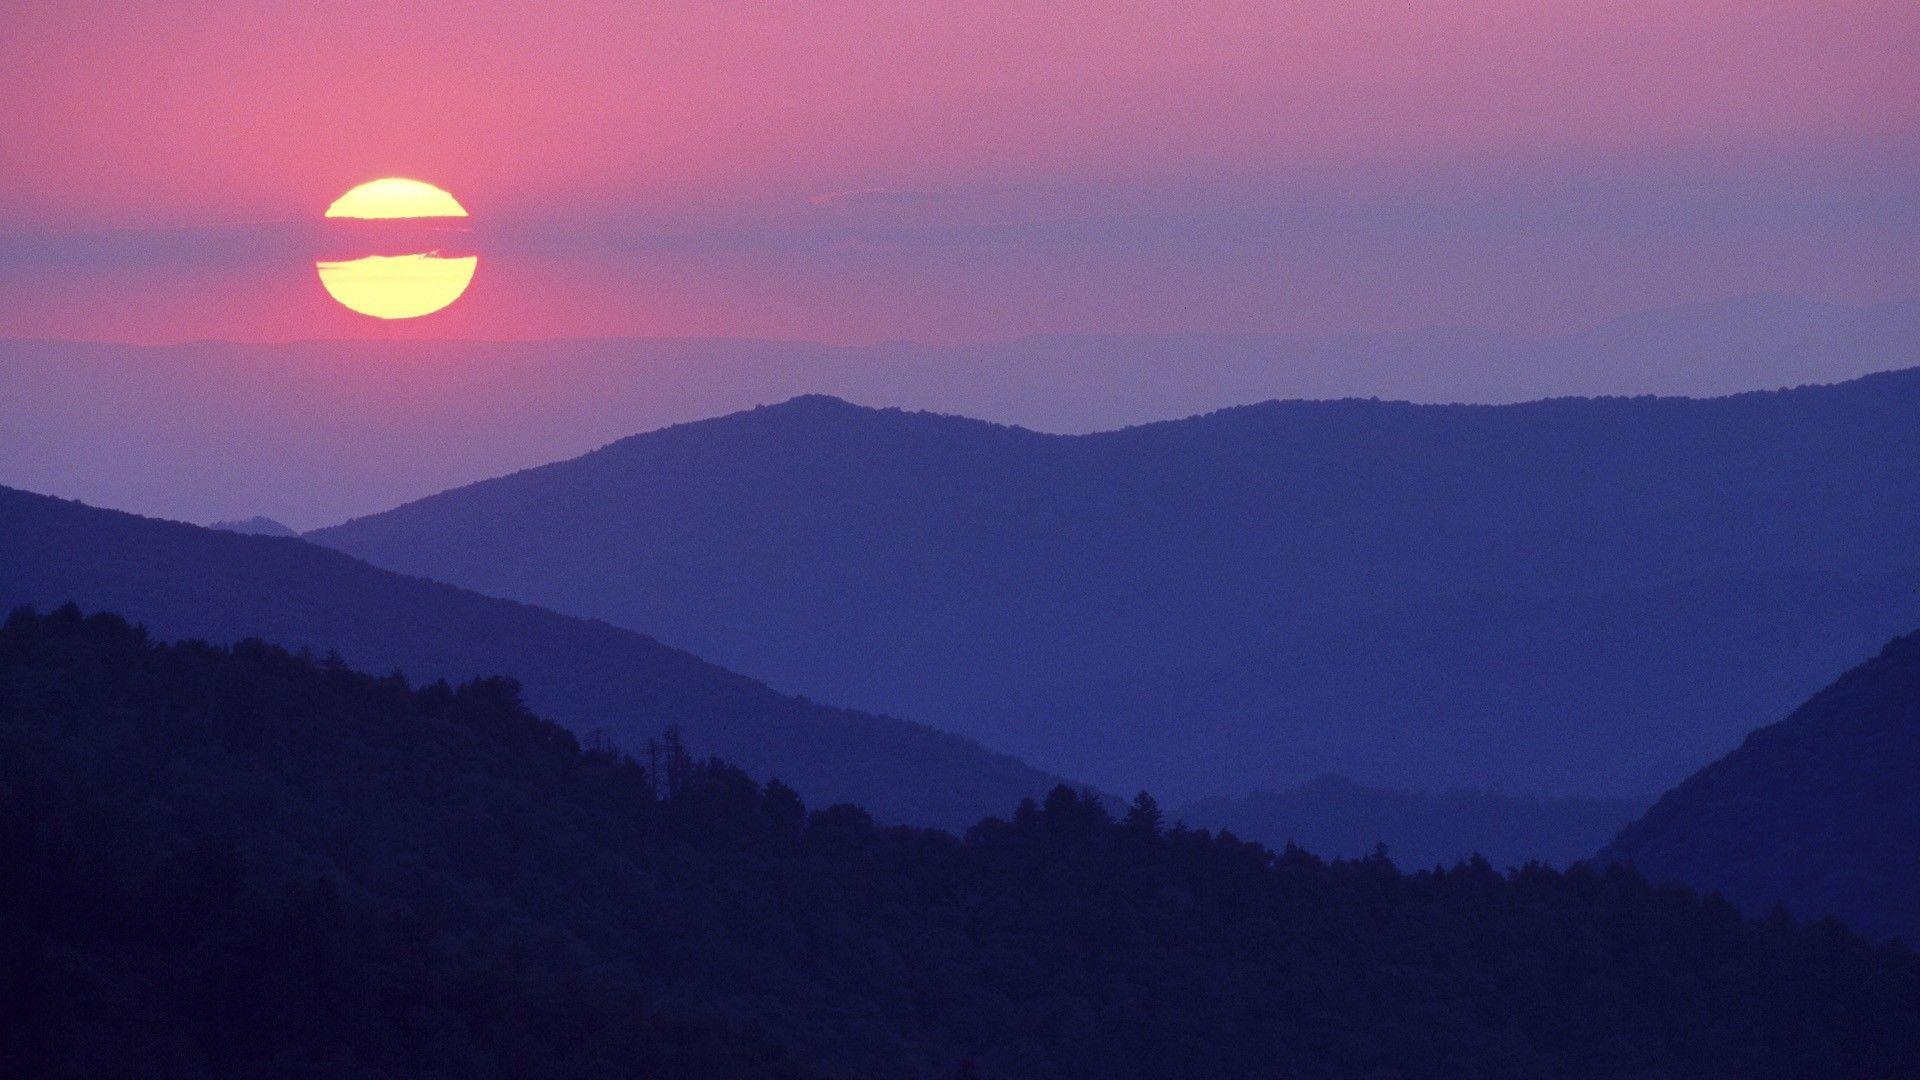 Solar Sunset Mountains Hd Landscape Mountain Sunset Landscape